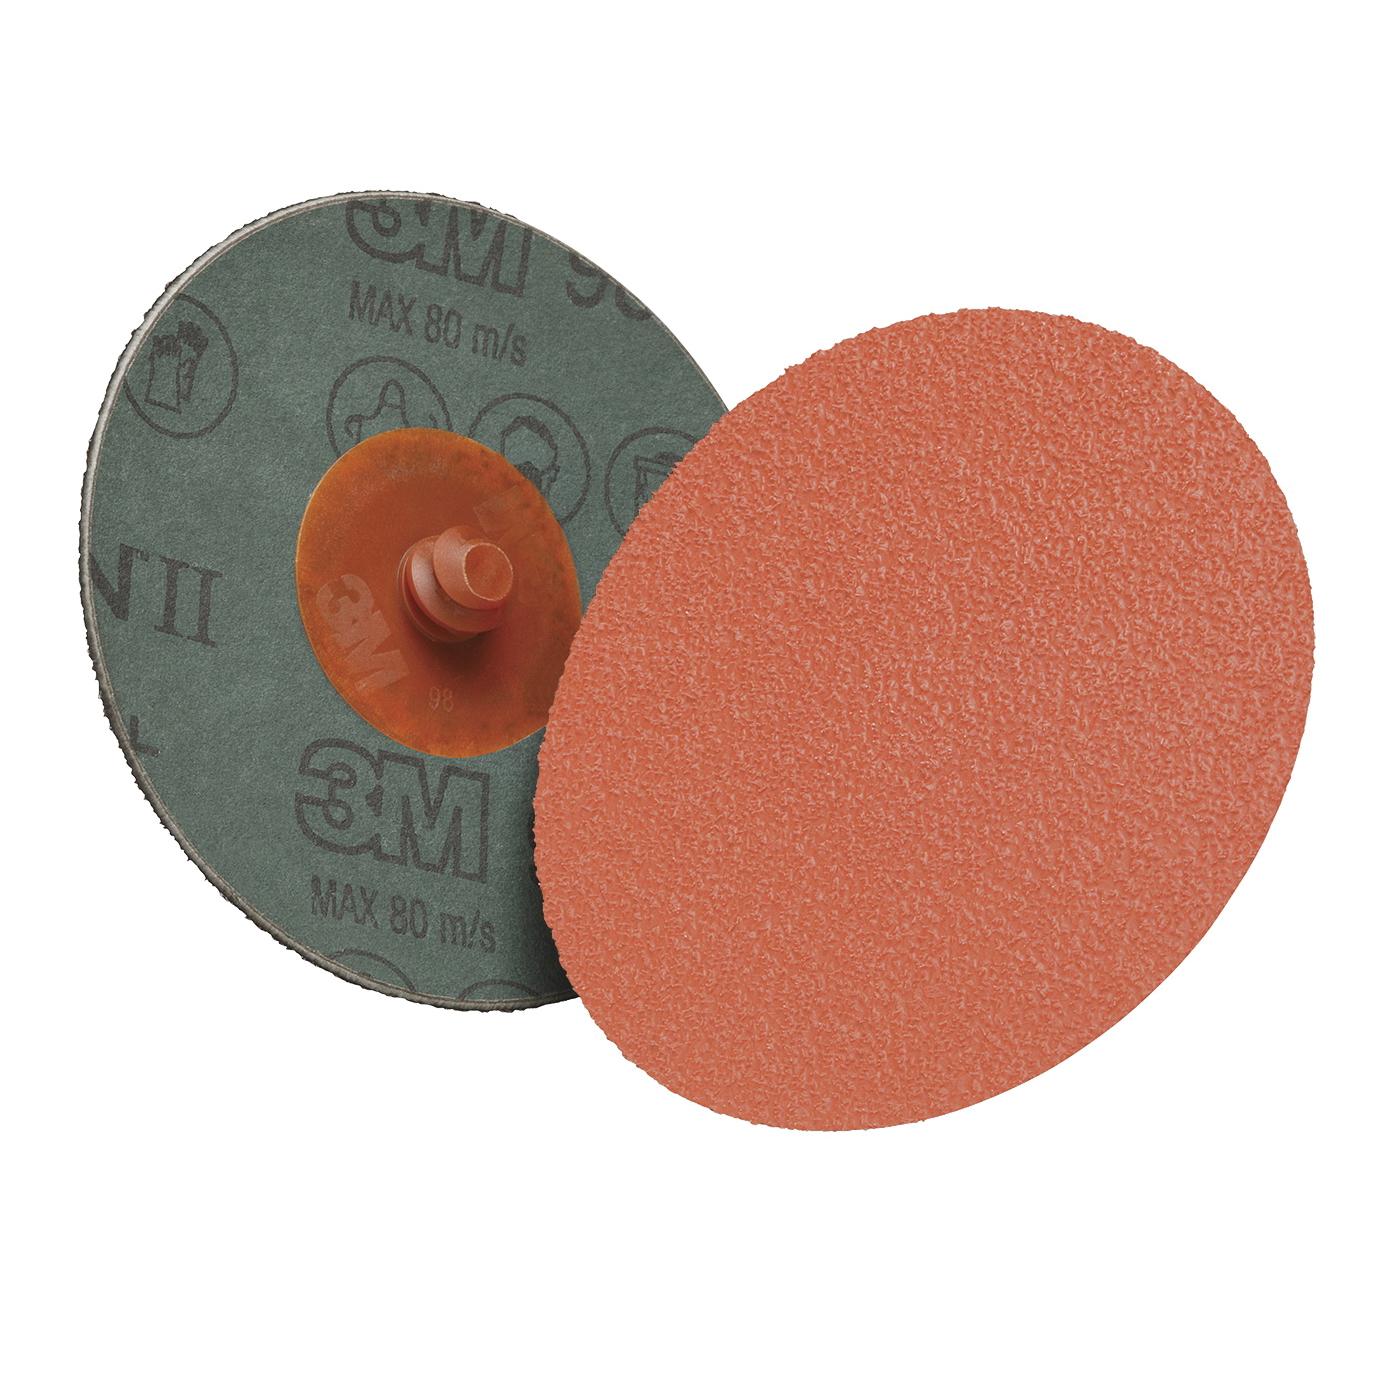 Cubitron™ II 051125-87153 Standard Depressed Center Wheel, 9 in Dia x 1/4 in THK, 36 Grit, Ceramic Abrasive